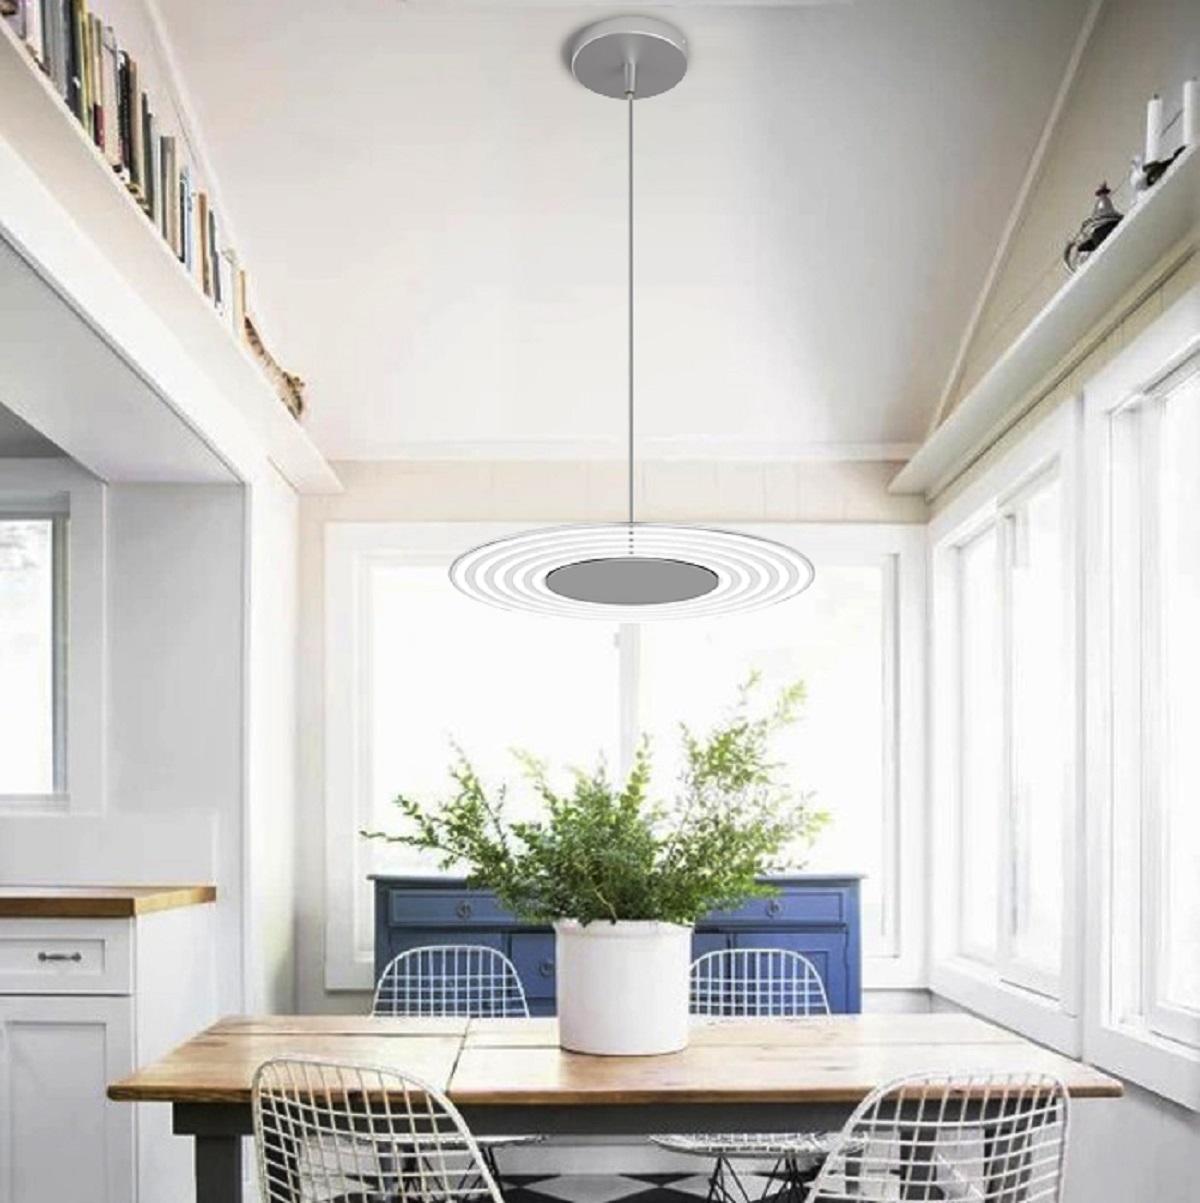 lampenhelden arteluna pendelleuchte adot circ aluminium glas wei gestreift 400mm 24w. Black Bedroom Furniture Sets. Home Design Ideas